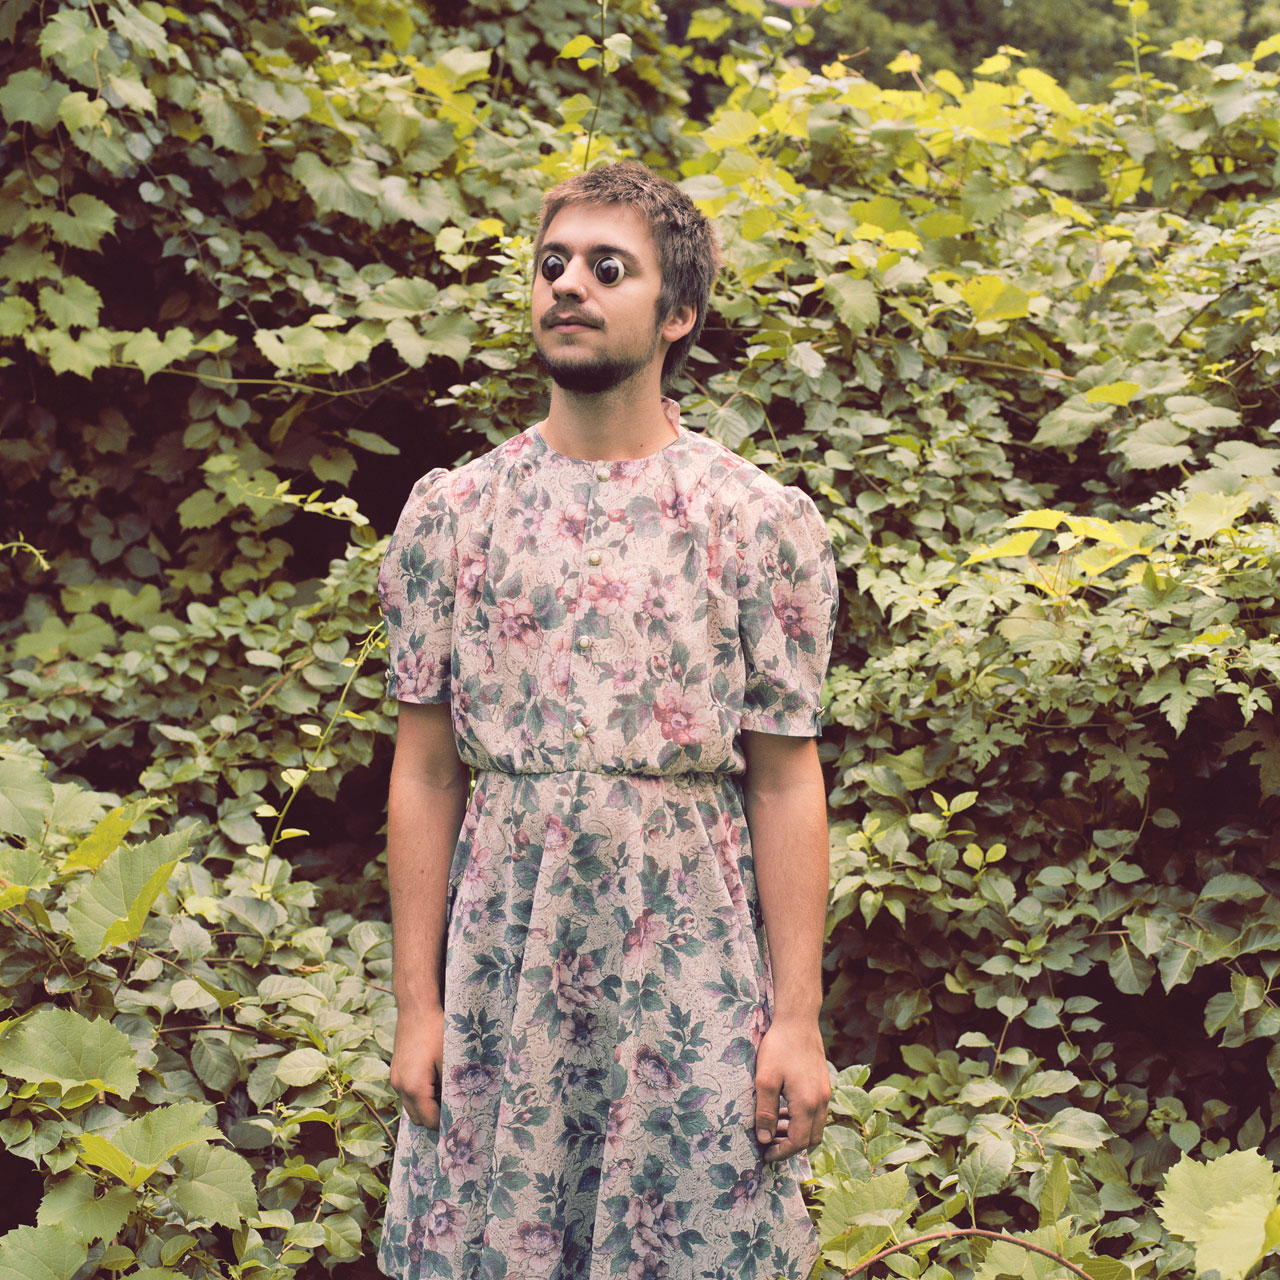 Nina Röder - on being divine - Felix Schoeller Photoaward